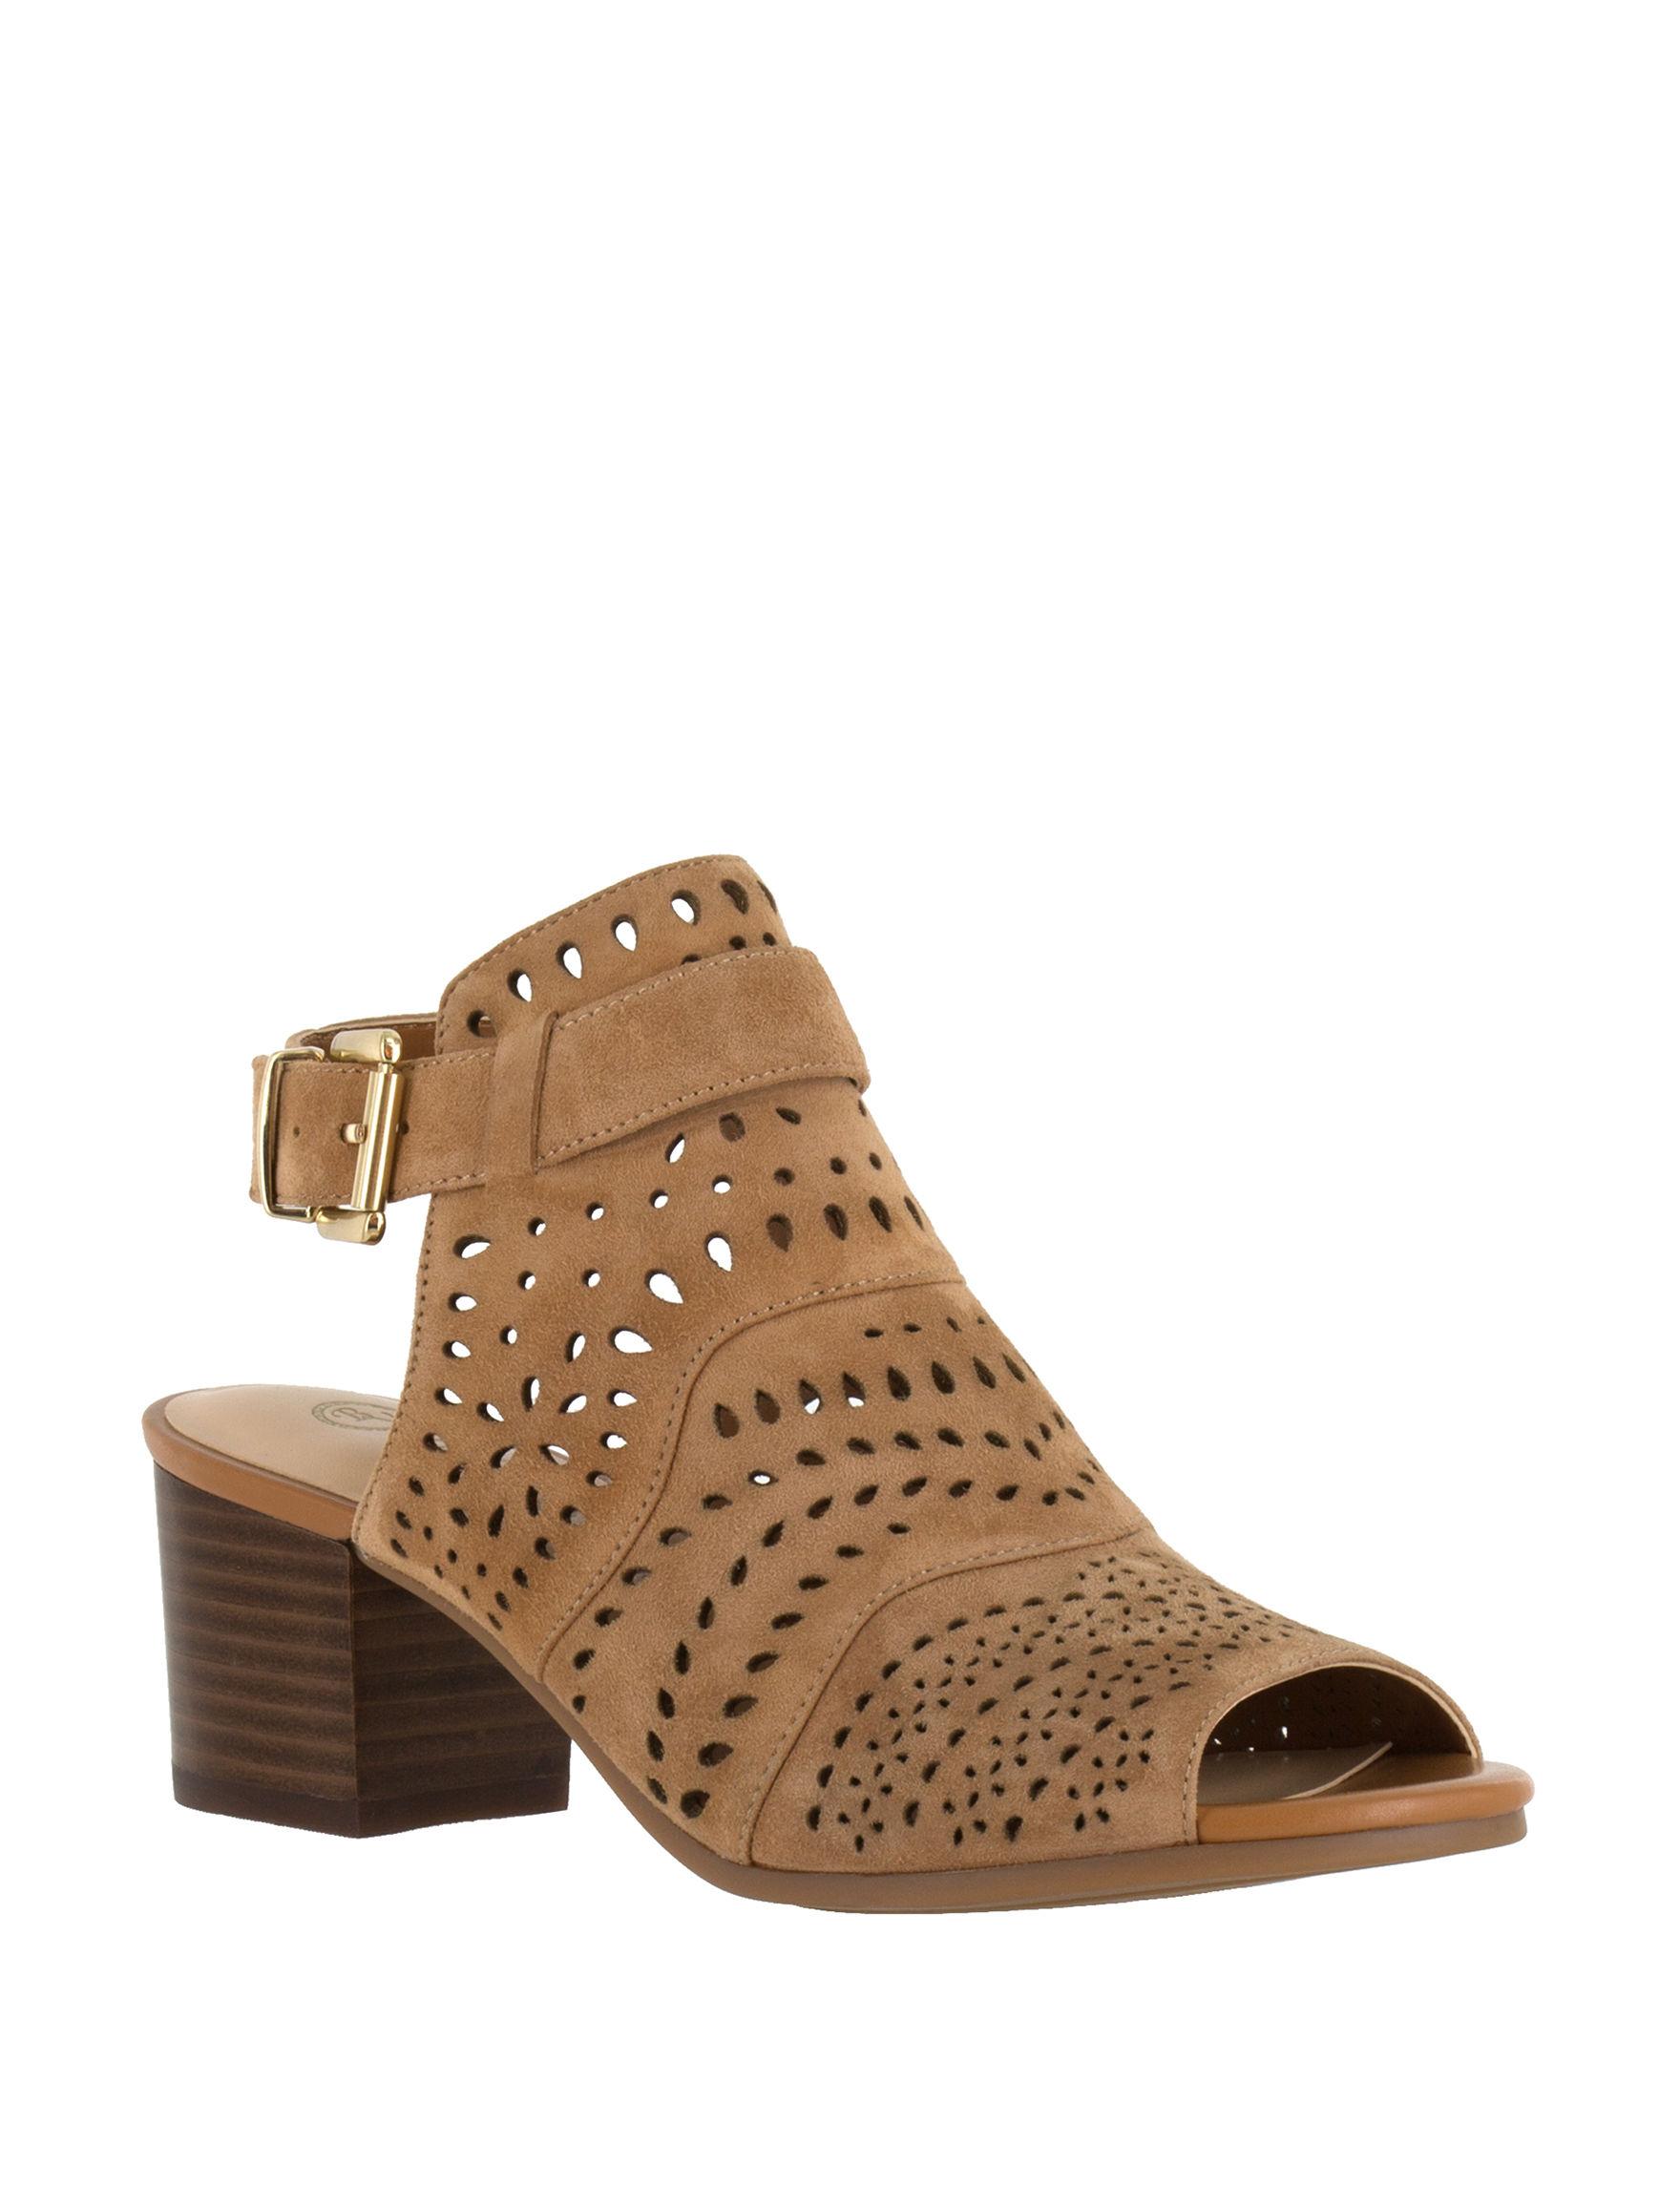 Bella Vita Natural Heeled Sandals Peep Toe